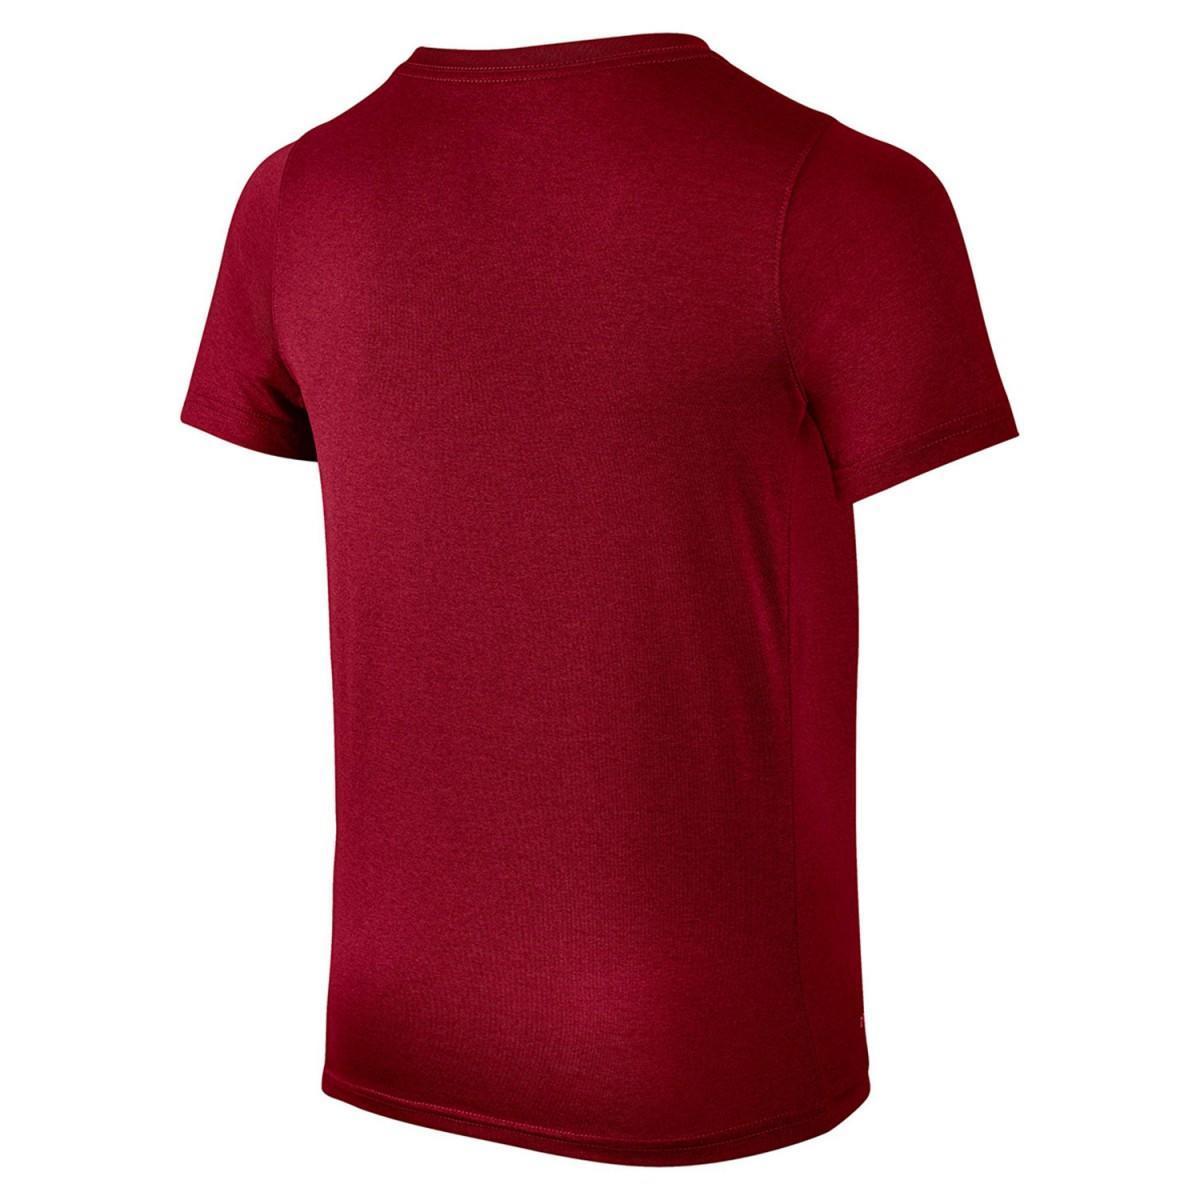 Теннисная футболка детская Nike Dry Tee SS Swoosh Solid dark red